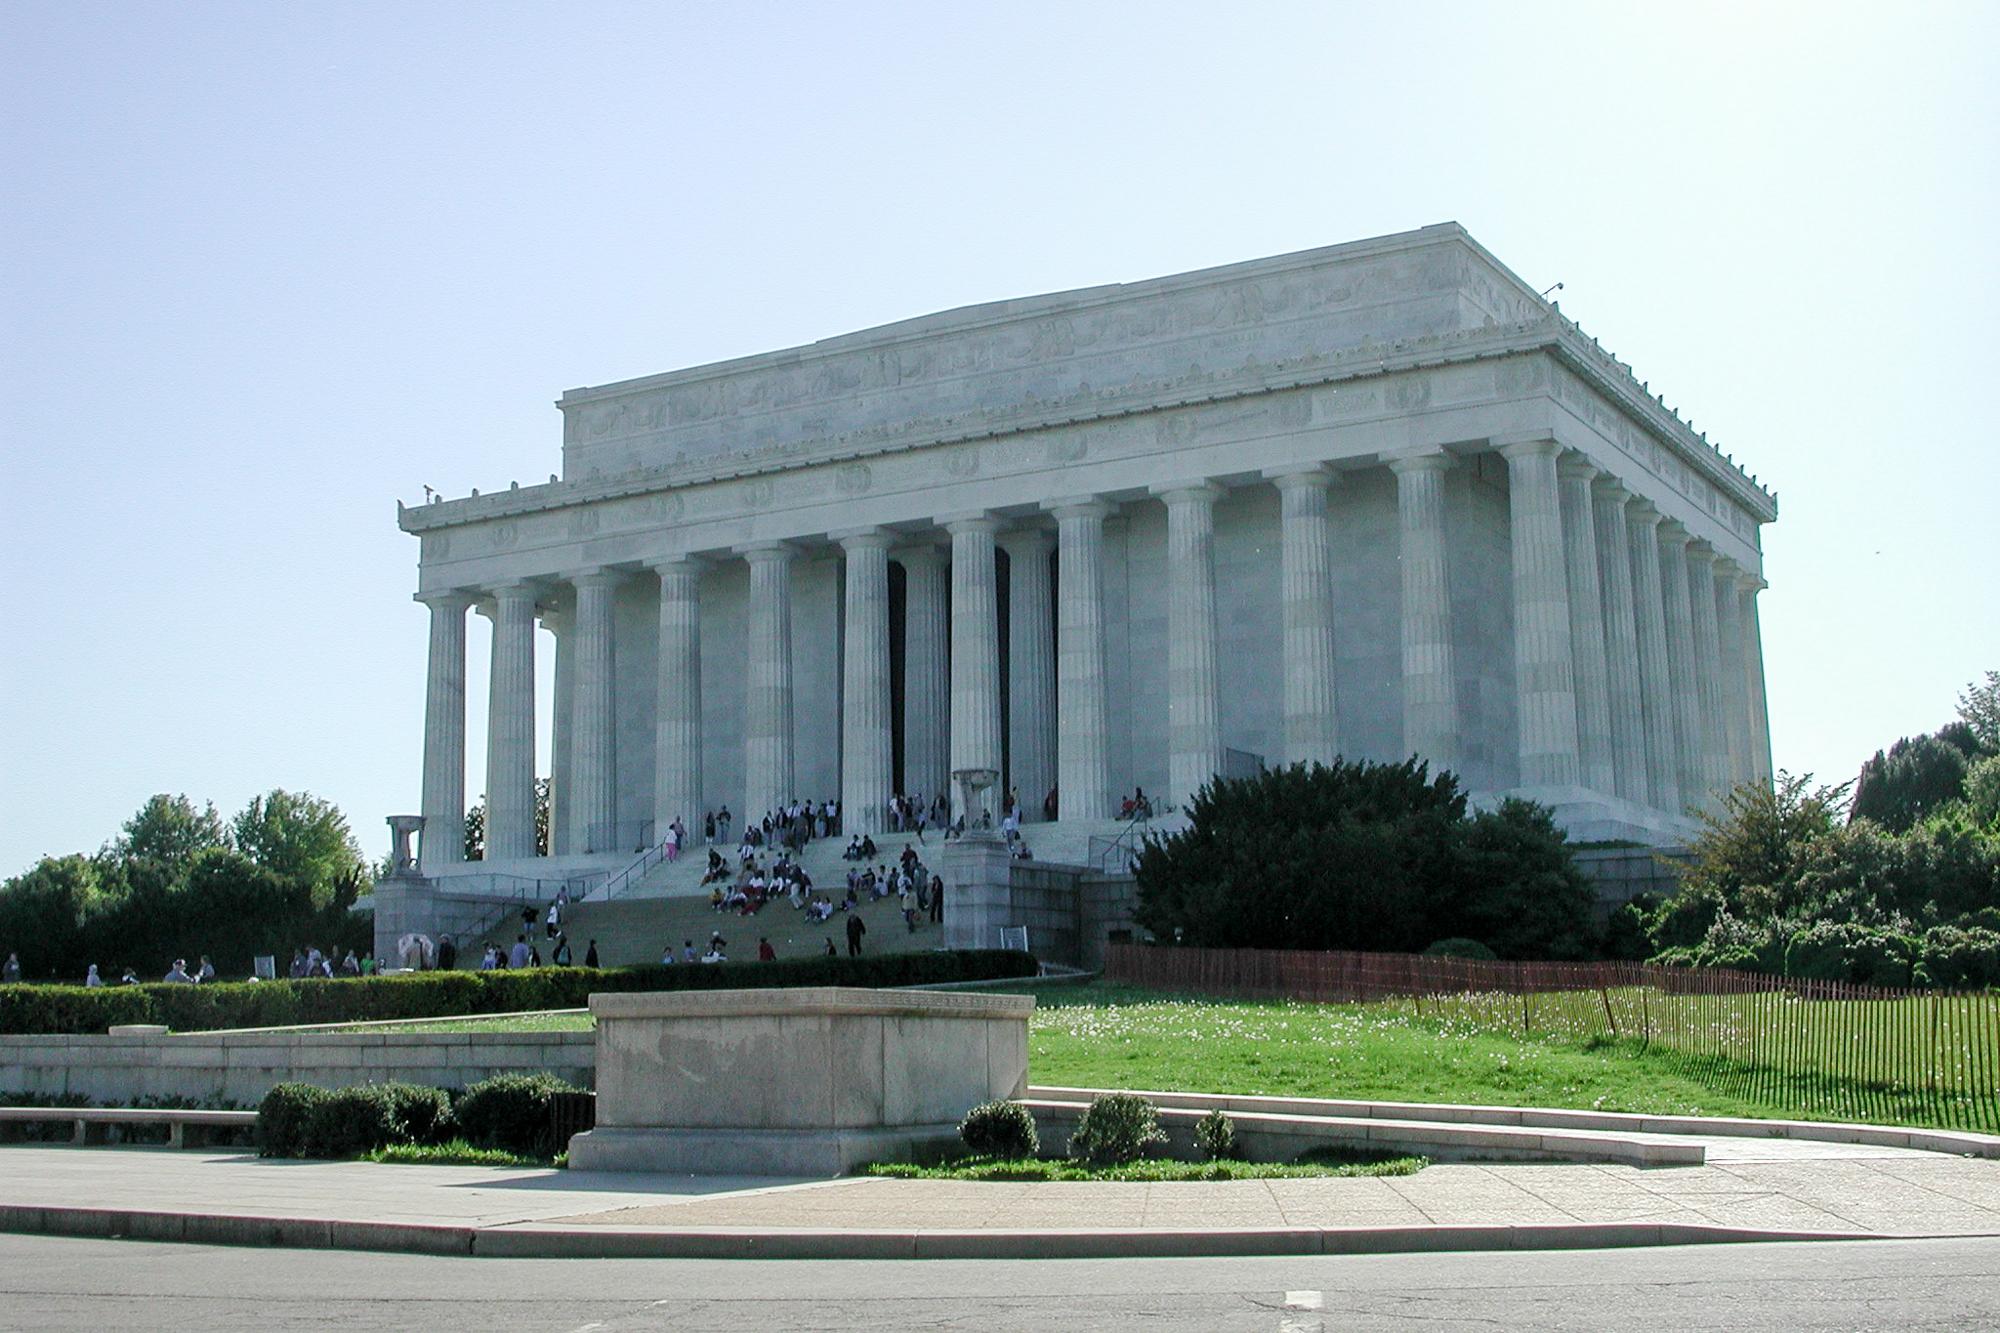 Visitors, Lincoln Memorial